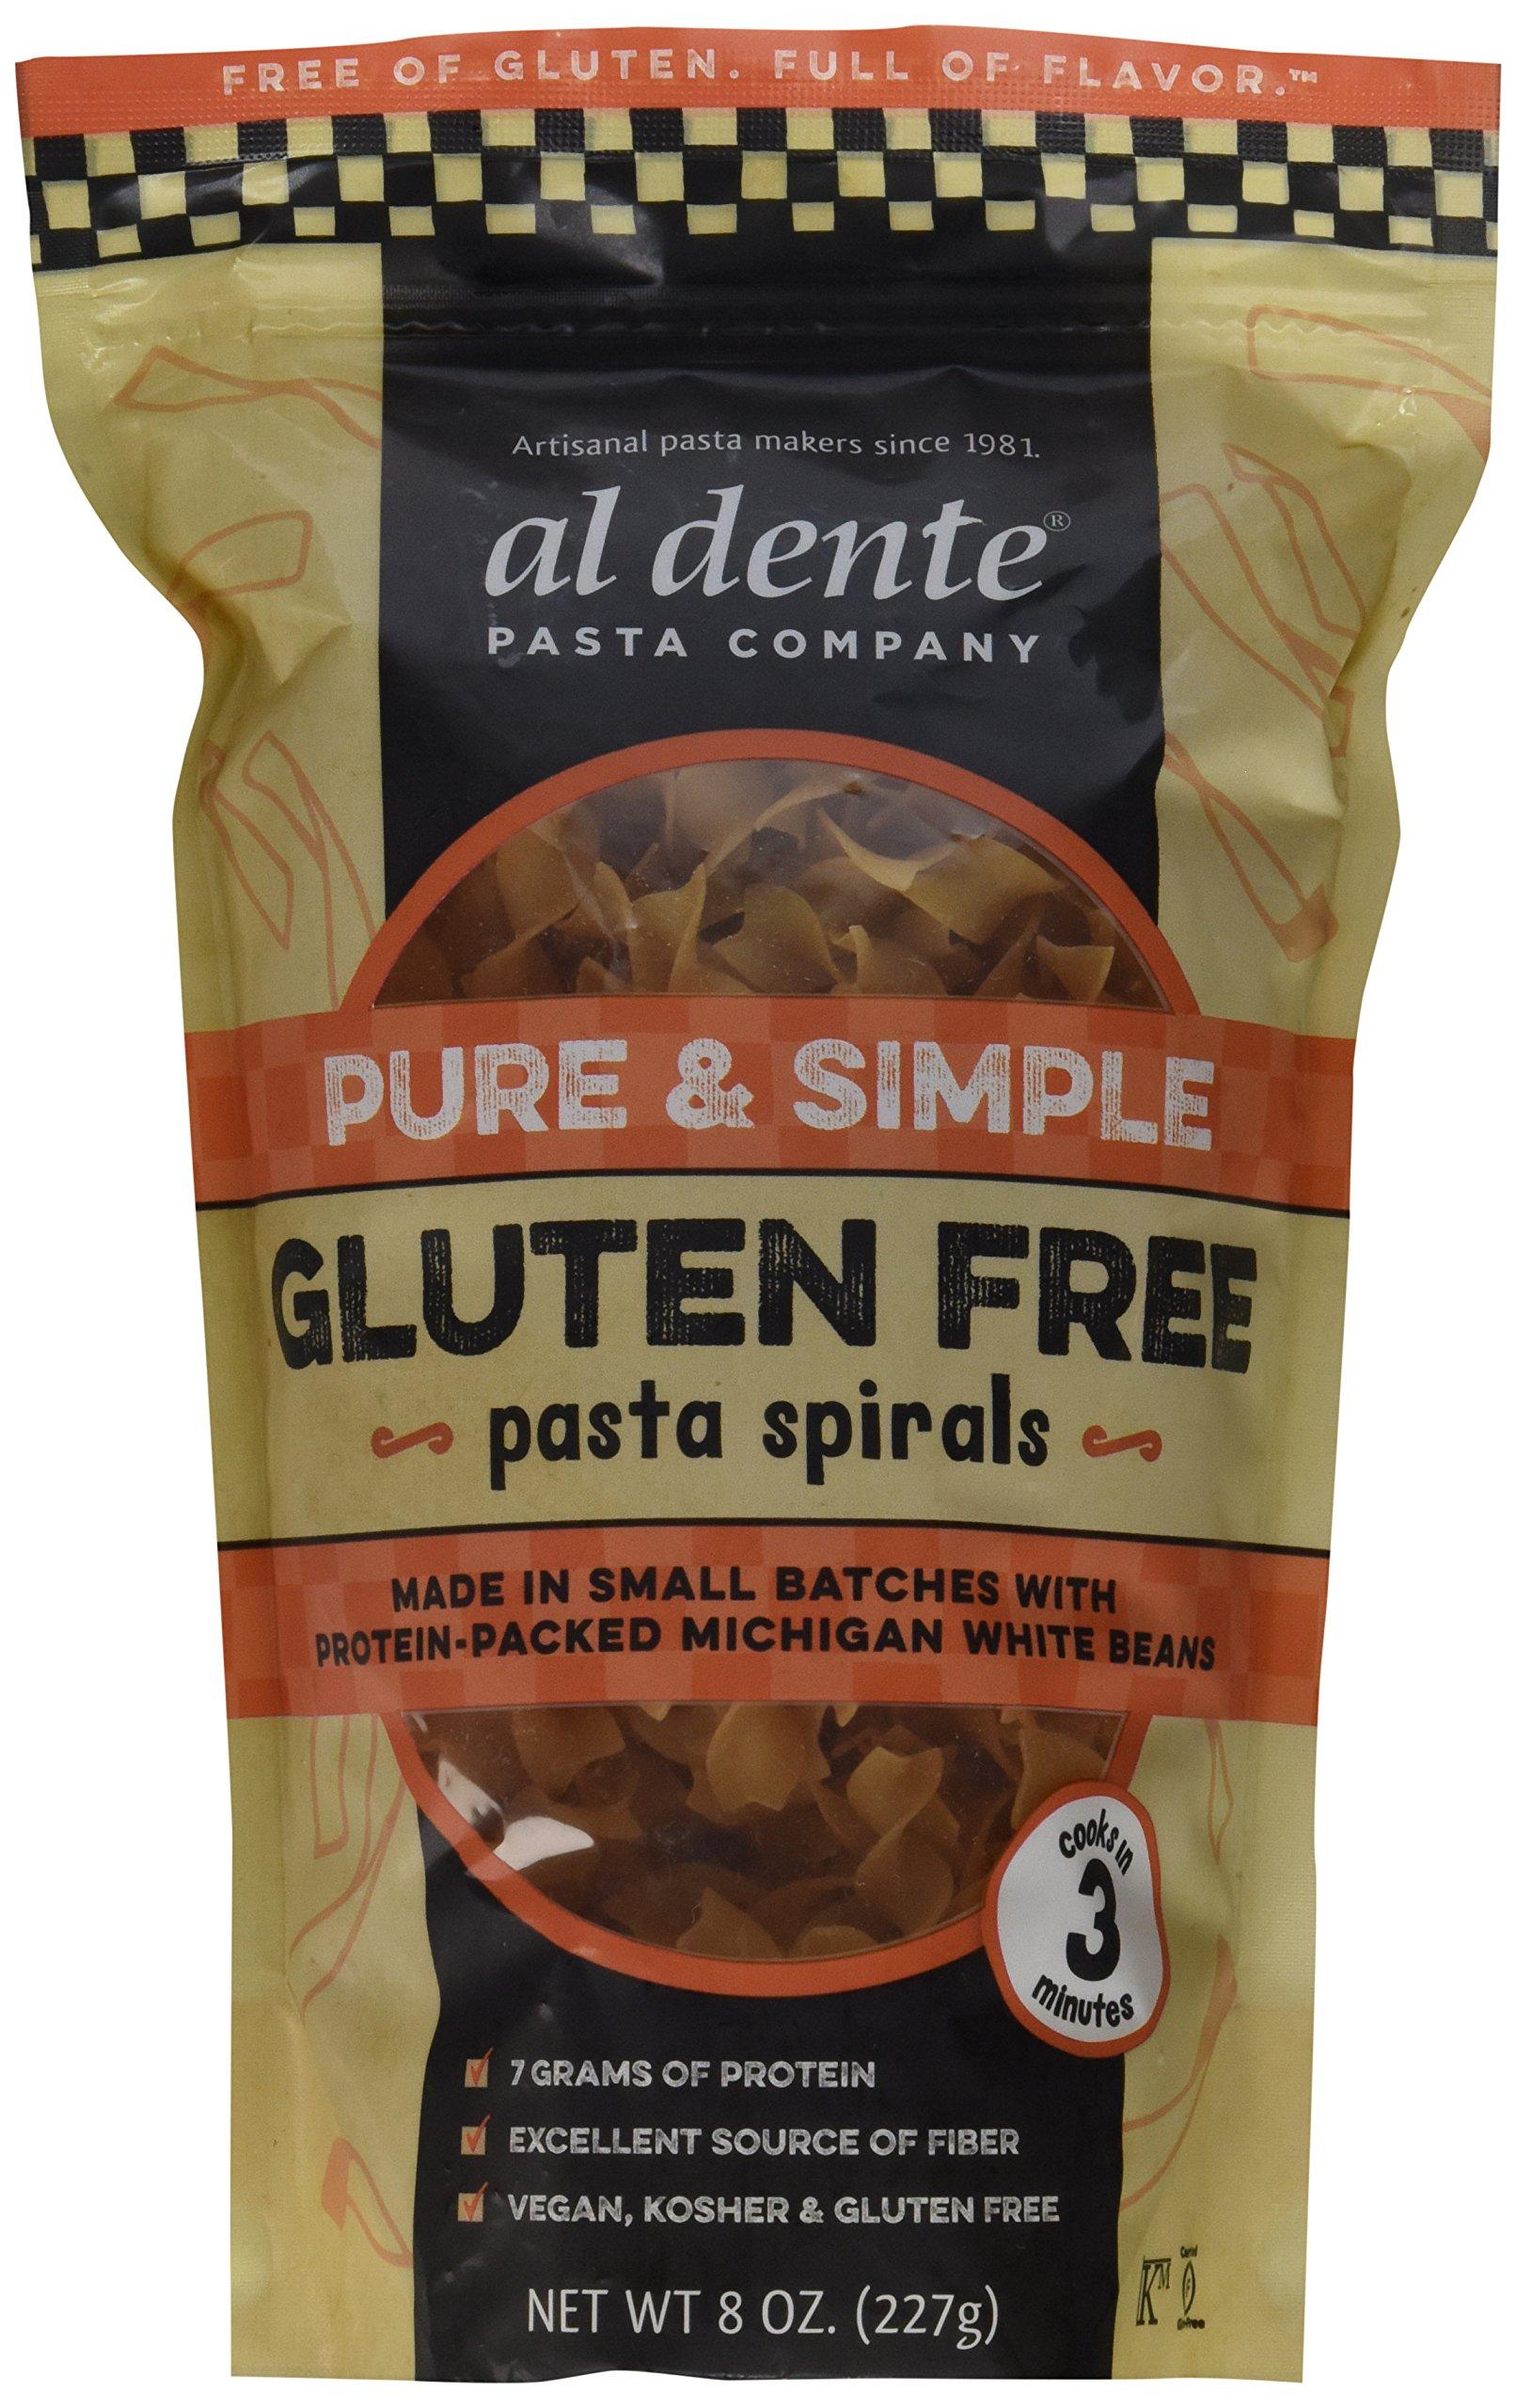 Al Dente Pure & Simple Gluten Free Pasta Spirals, 6Count by AL DENTE